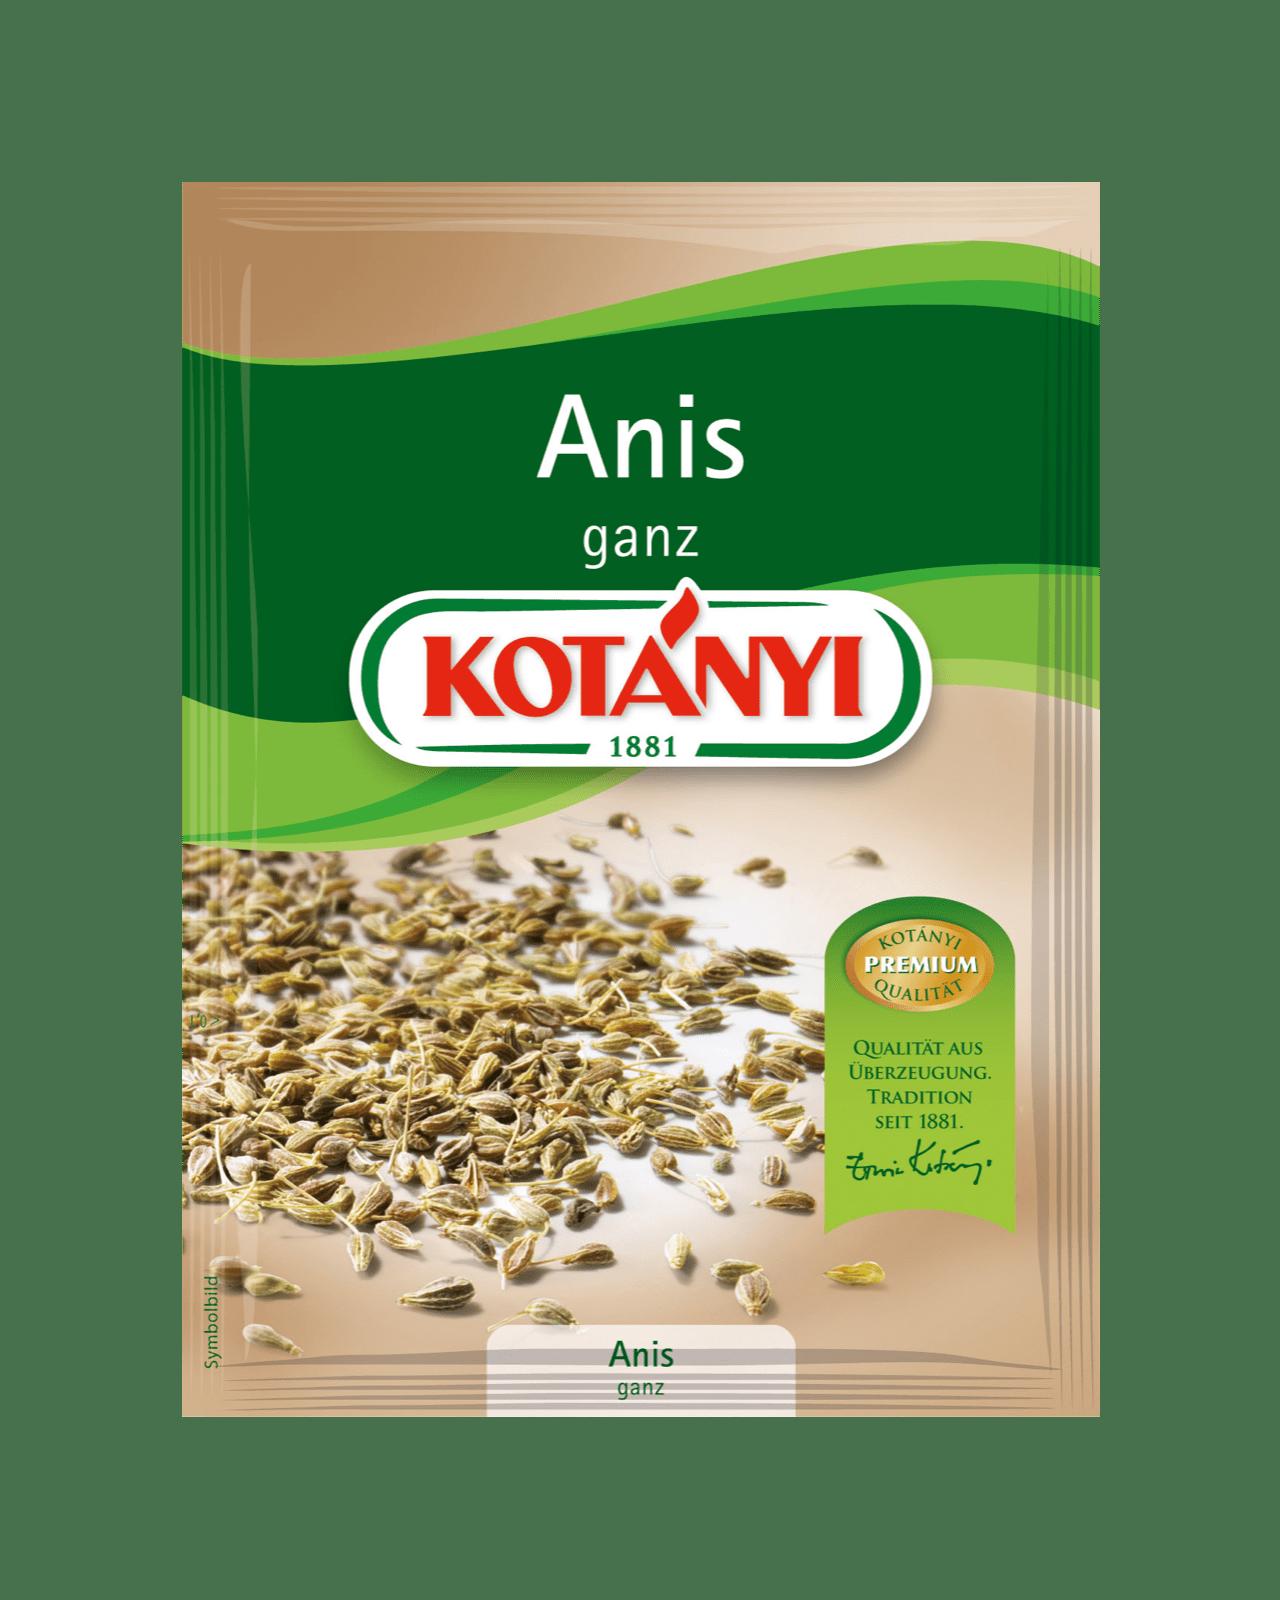 Kotányi Anis ganz im Brief